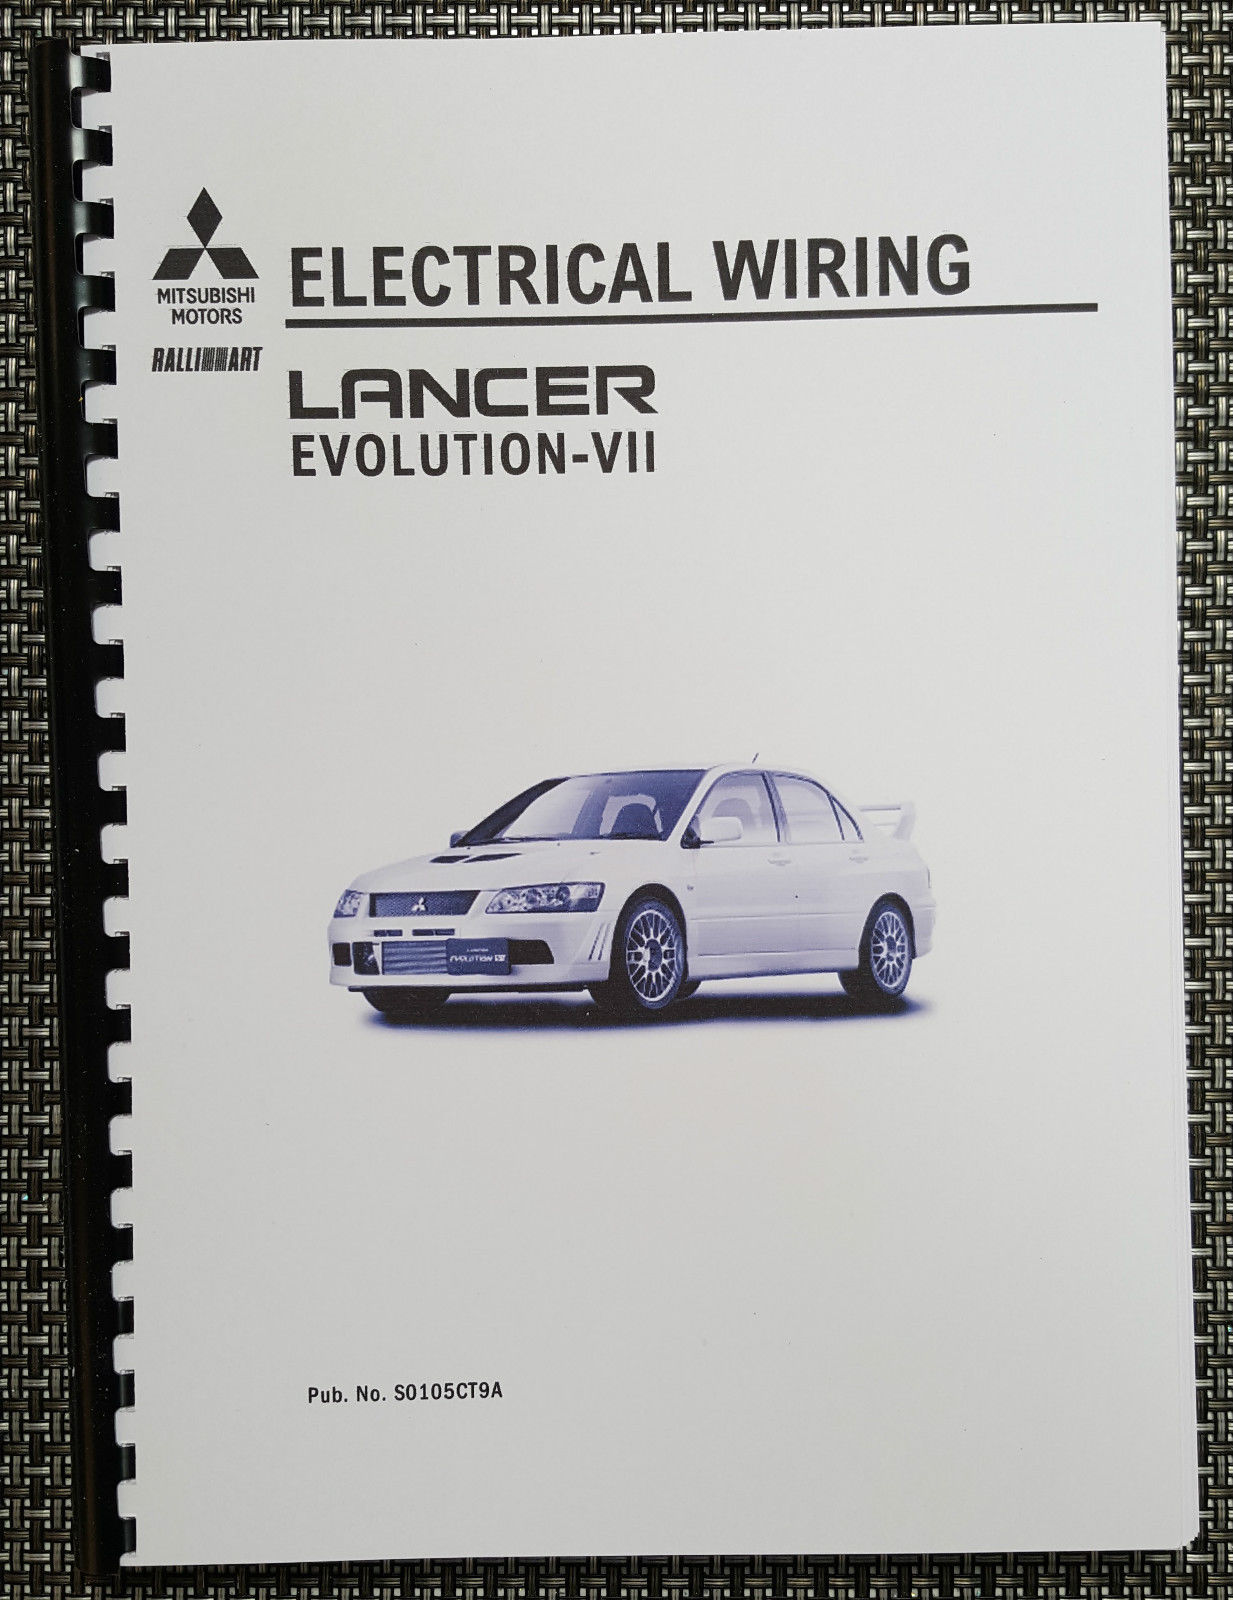 mitsubishi lancer evo vii electrical wiring and 50 similar items rh bonanza com 2014 Mitsubishi Lancer Evolution Mitsubishi Lancer EVO 13